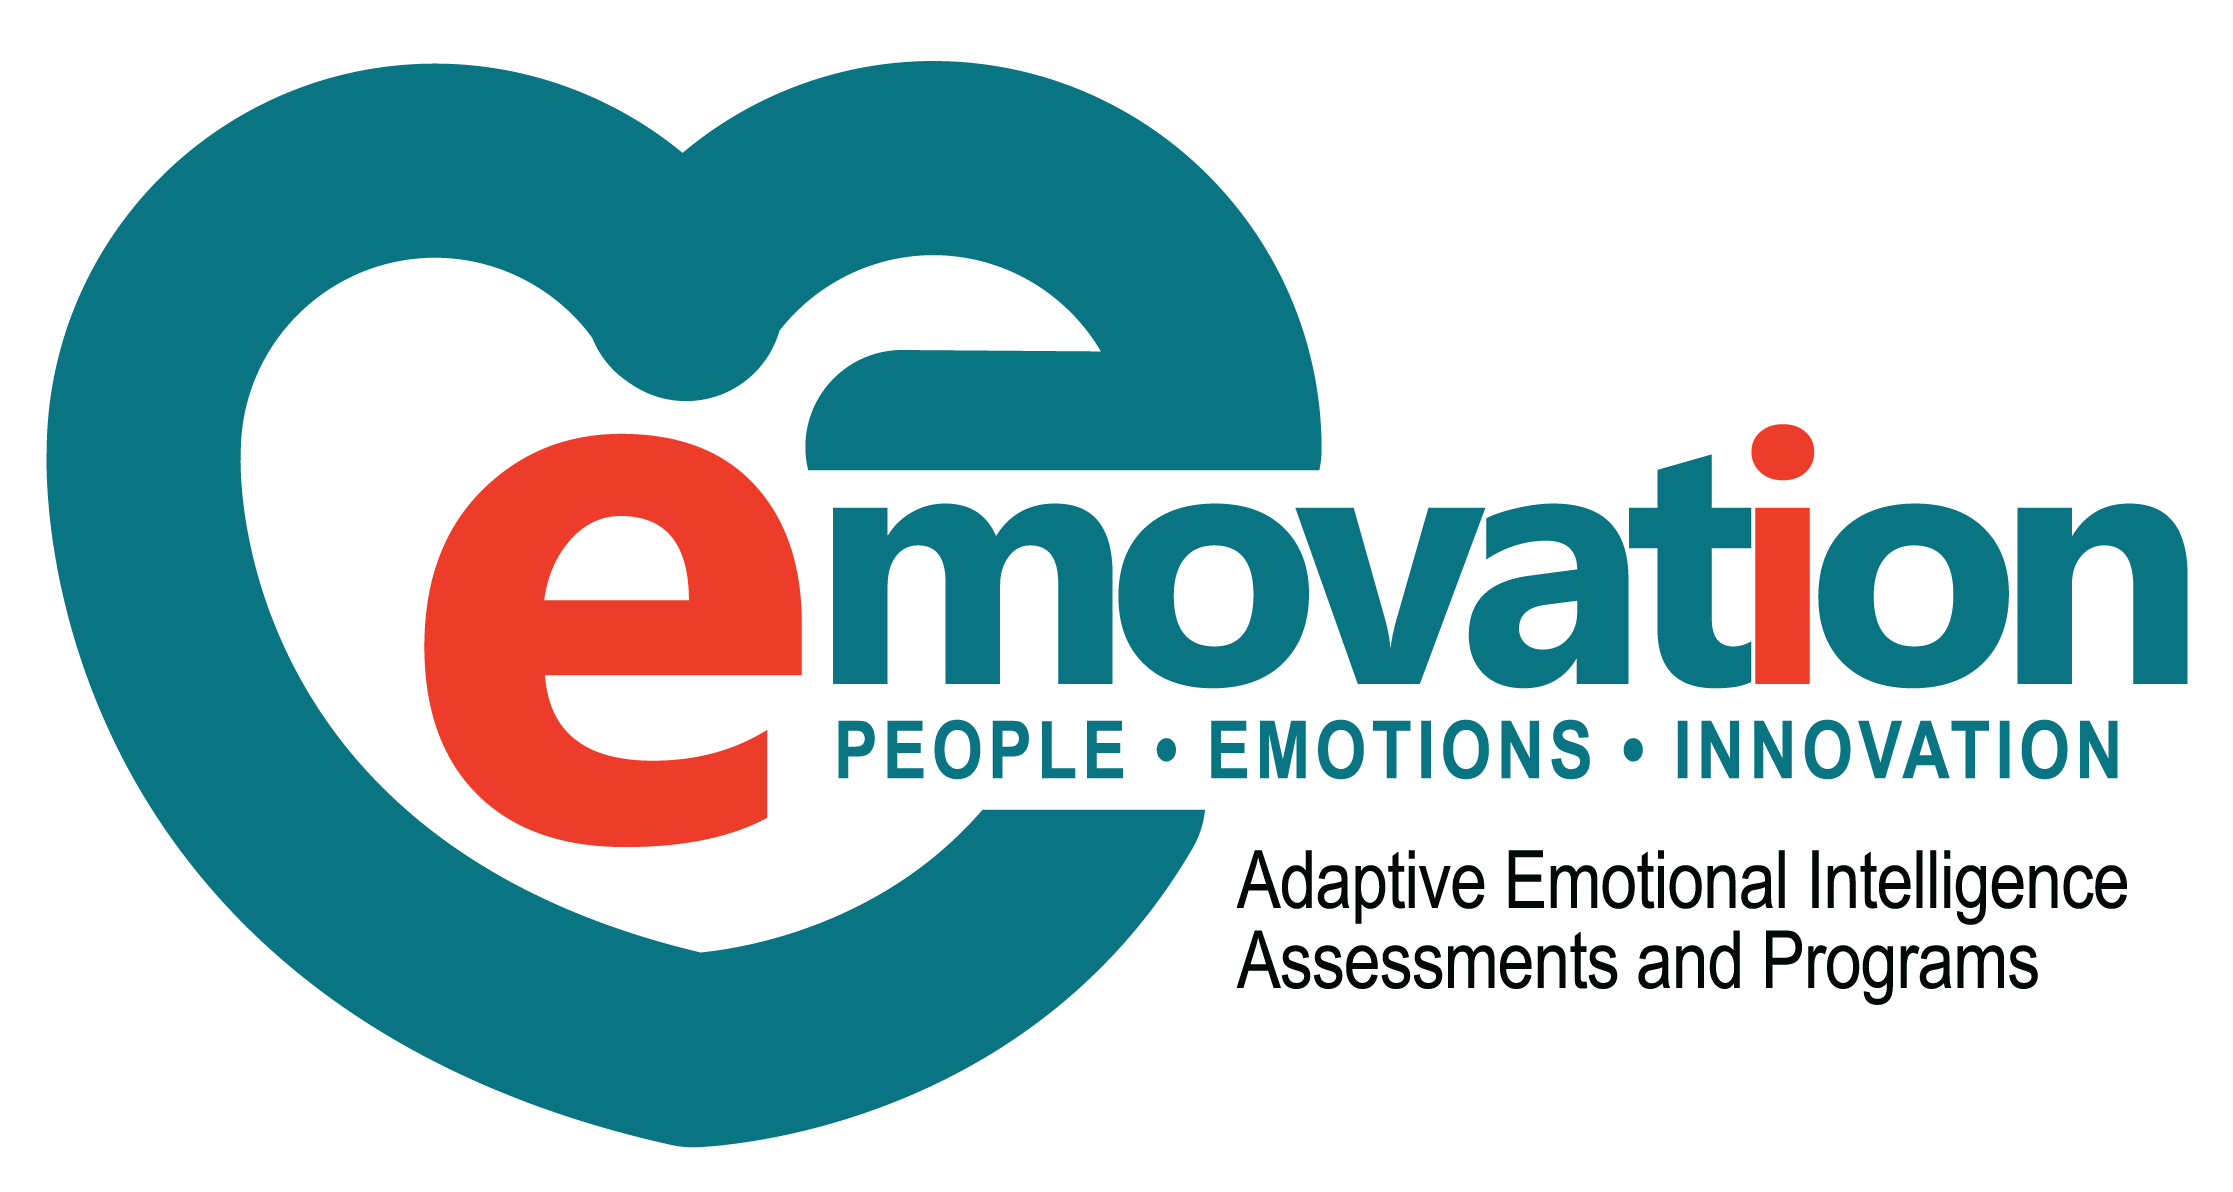 Emovation logo